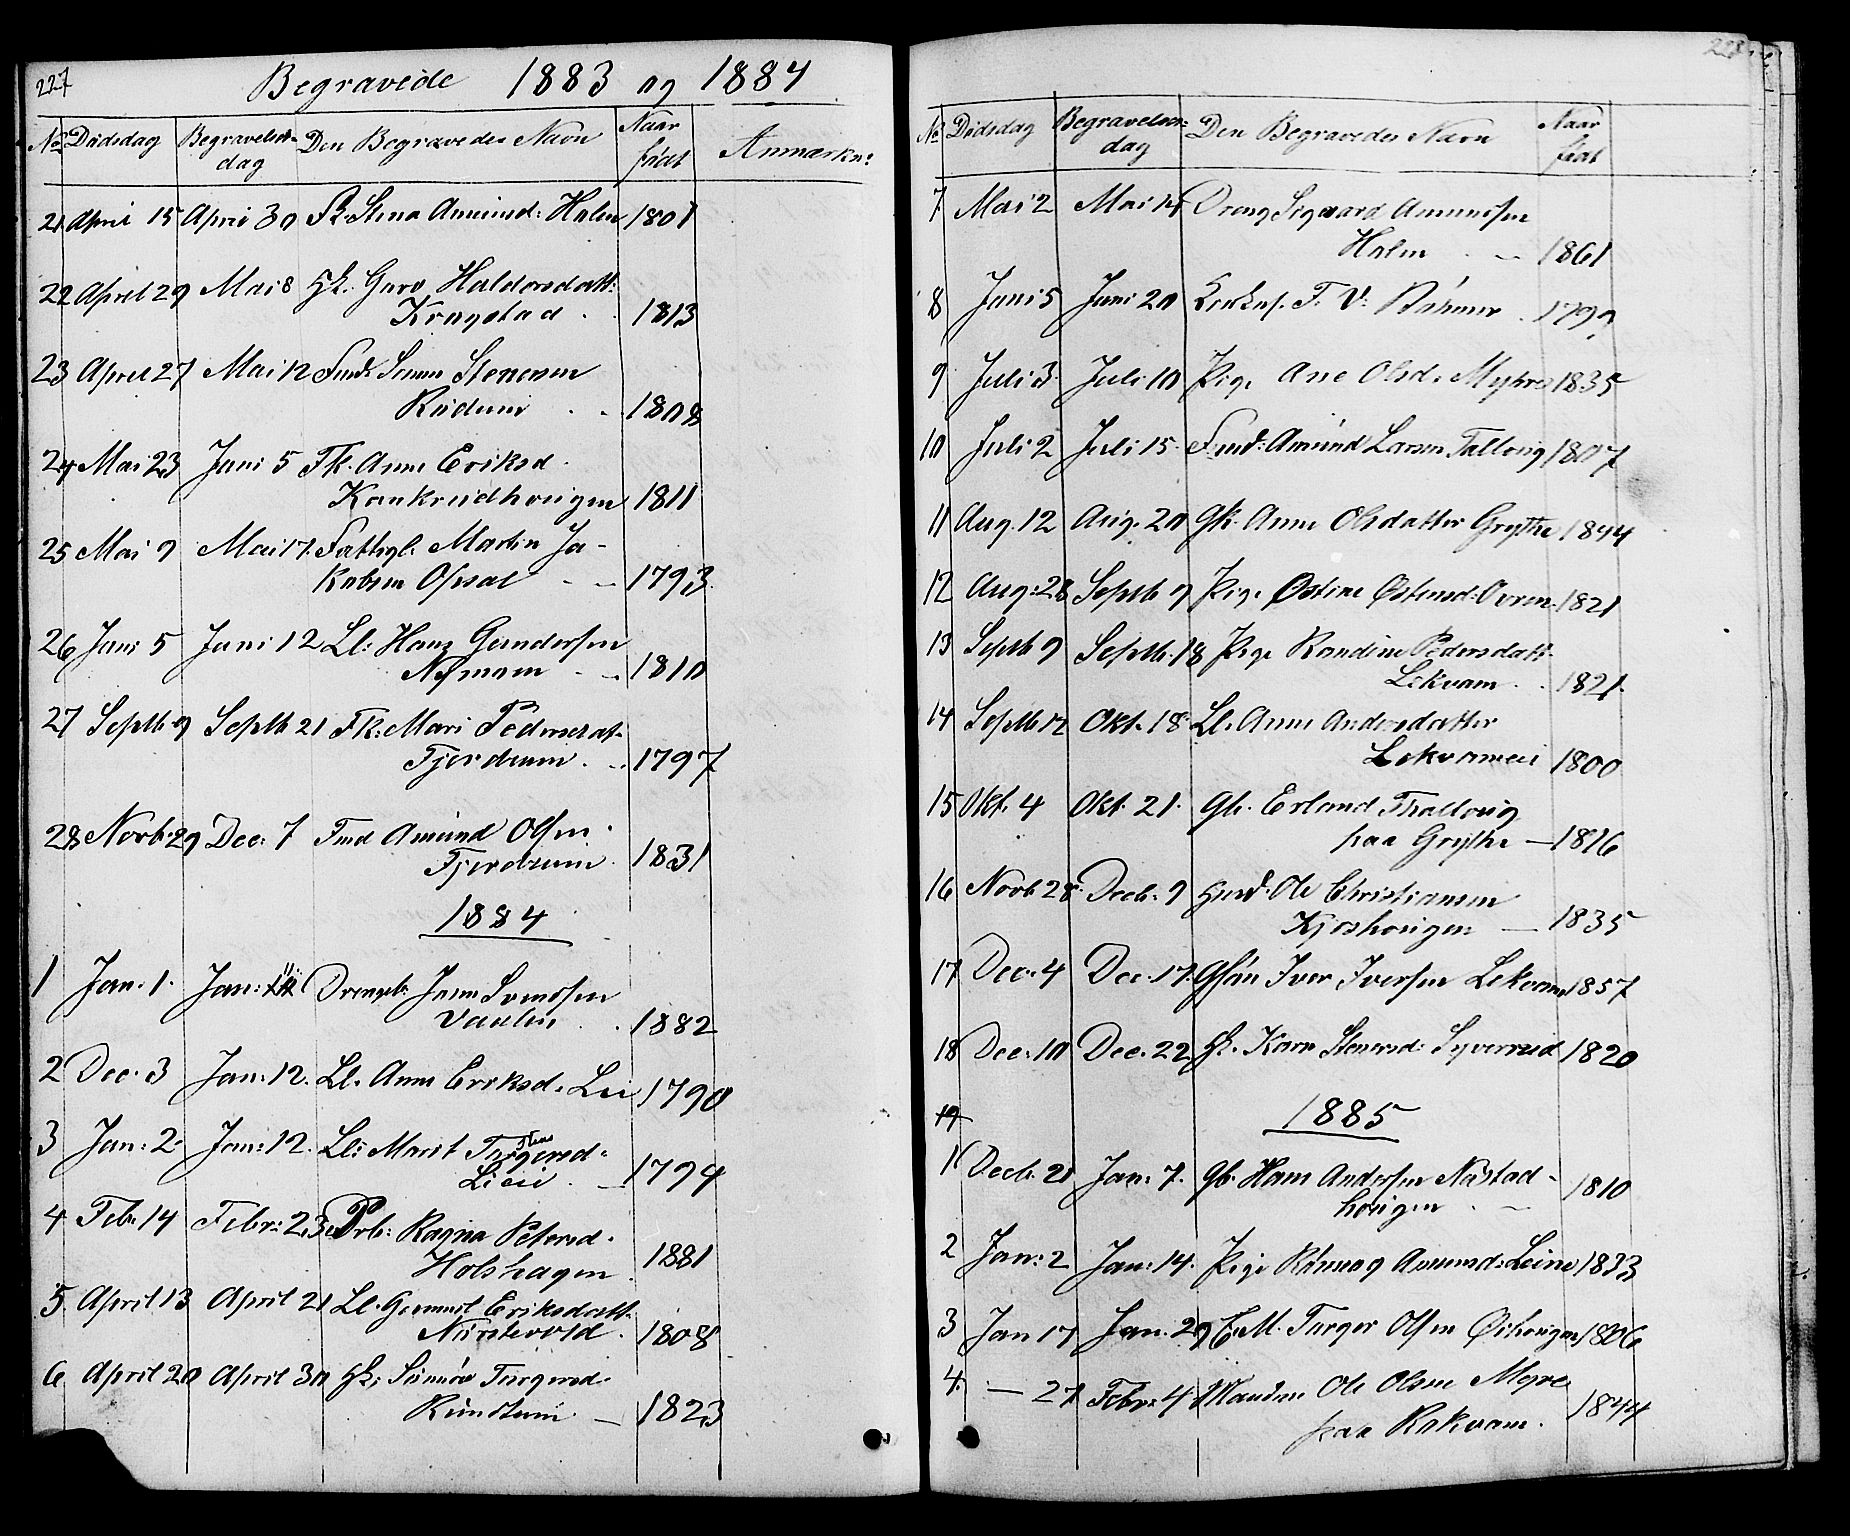 SAH, Østre Gausdal prestekontor, Klokkerbok nr. 1, 1863-1893, s. 227-228